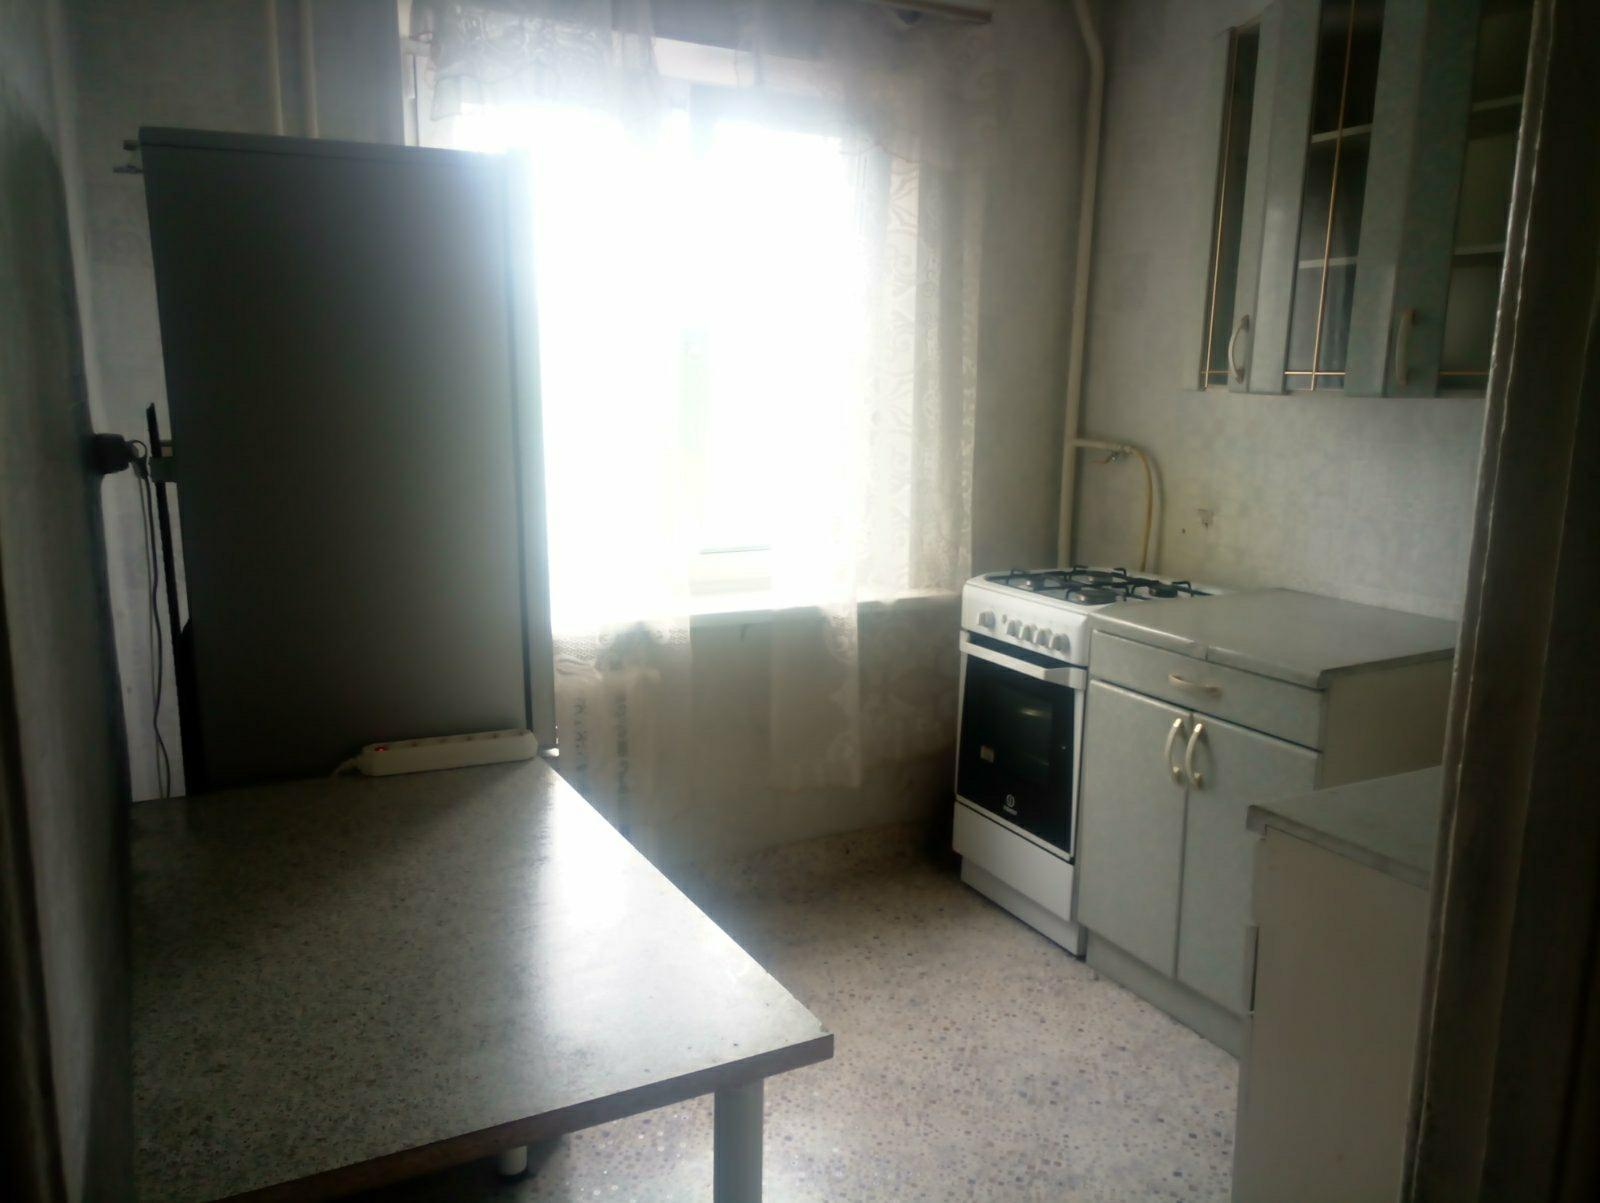 2к квартира улица Семафорная, 445 корпус 4 | 13500 | аренда в Красноярске фото 4